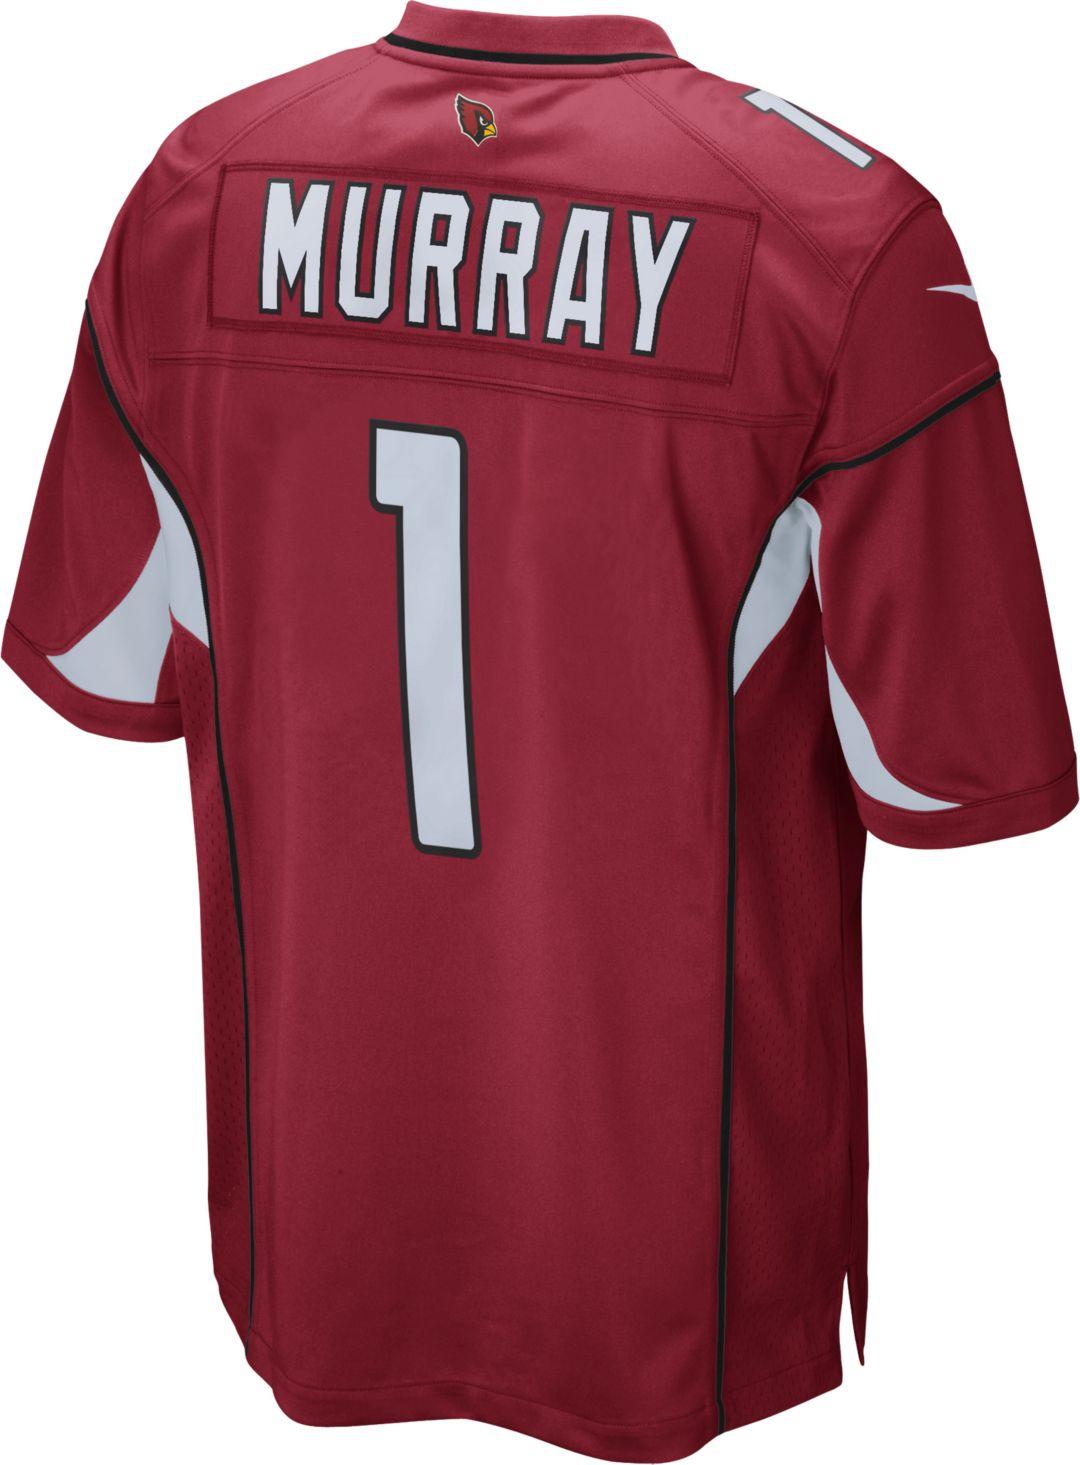 premium selection 07cd6 ef5cd Nike Youth Home Game Jersey Arizona Cardinals Kyler Murray #1